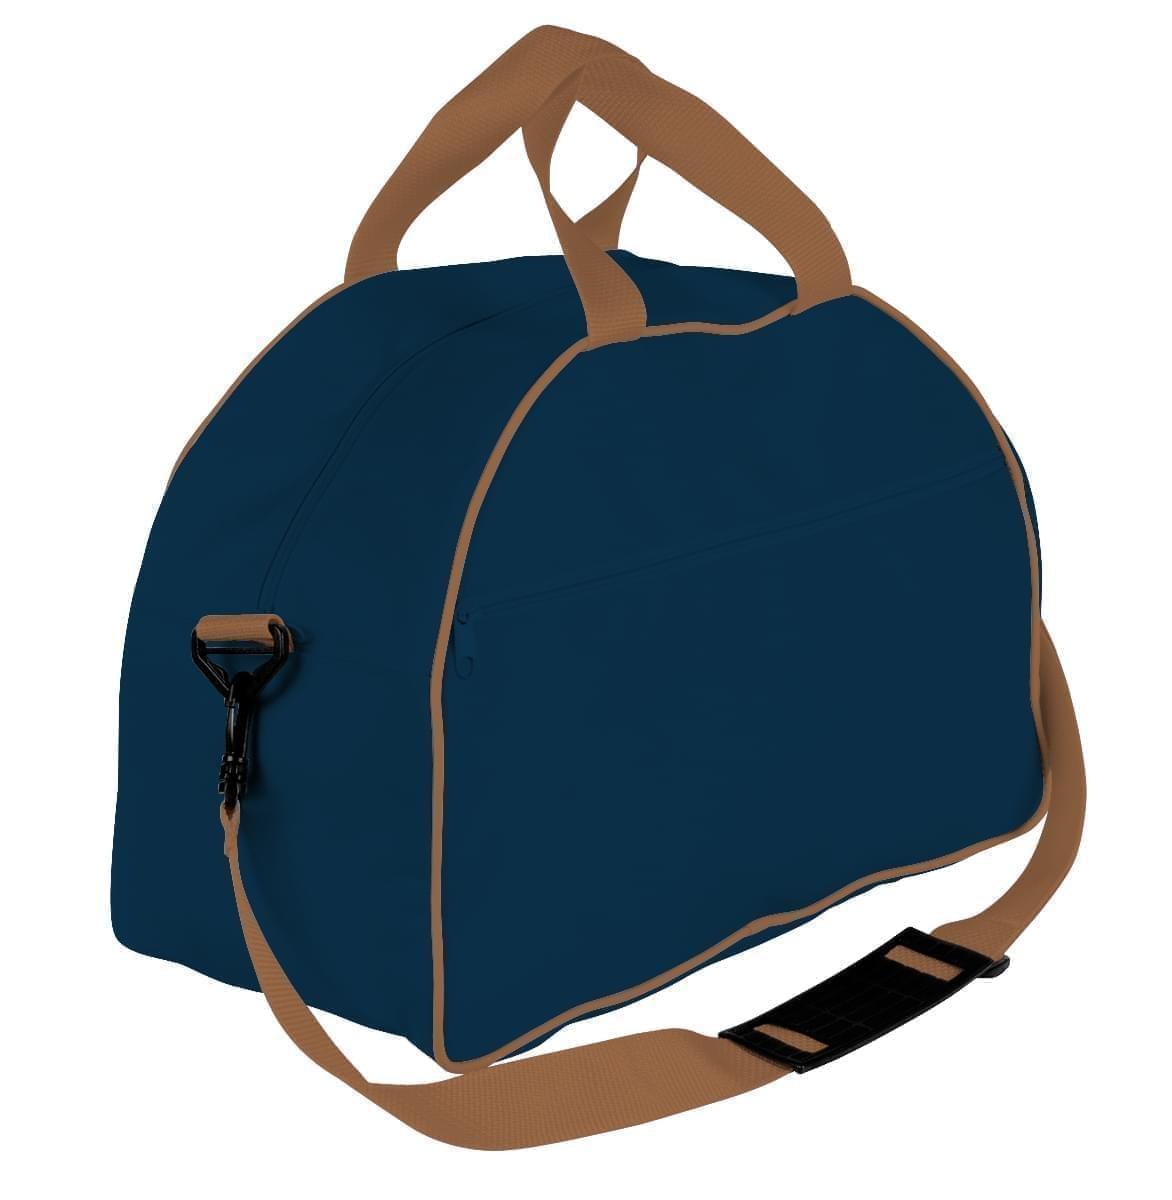 USA Made Nylon Poly Weekender Duffel Bags, Navy-Bronze, 6PKV32JAVO